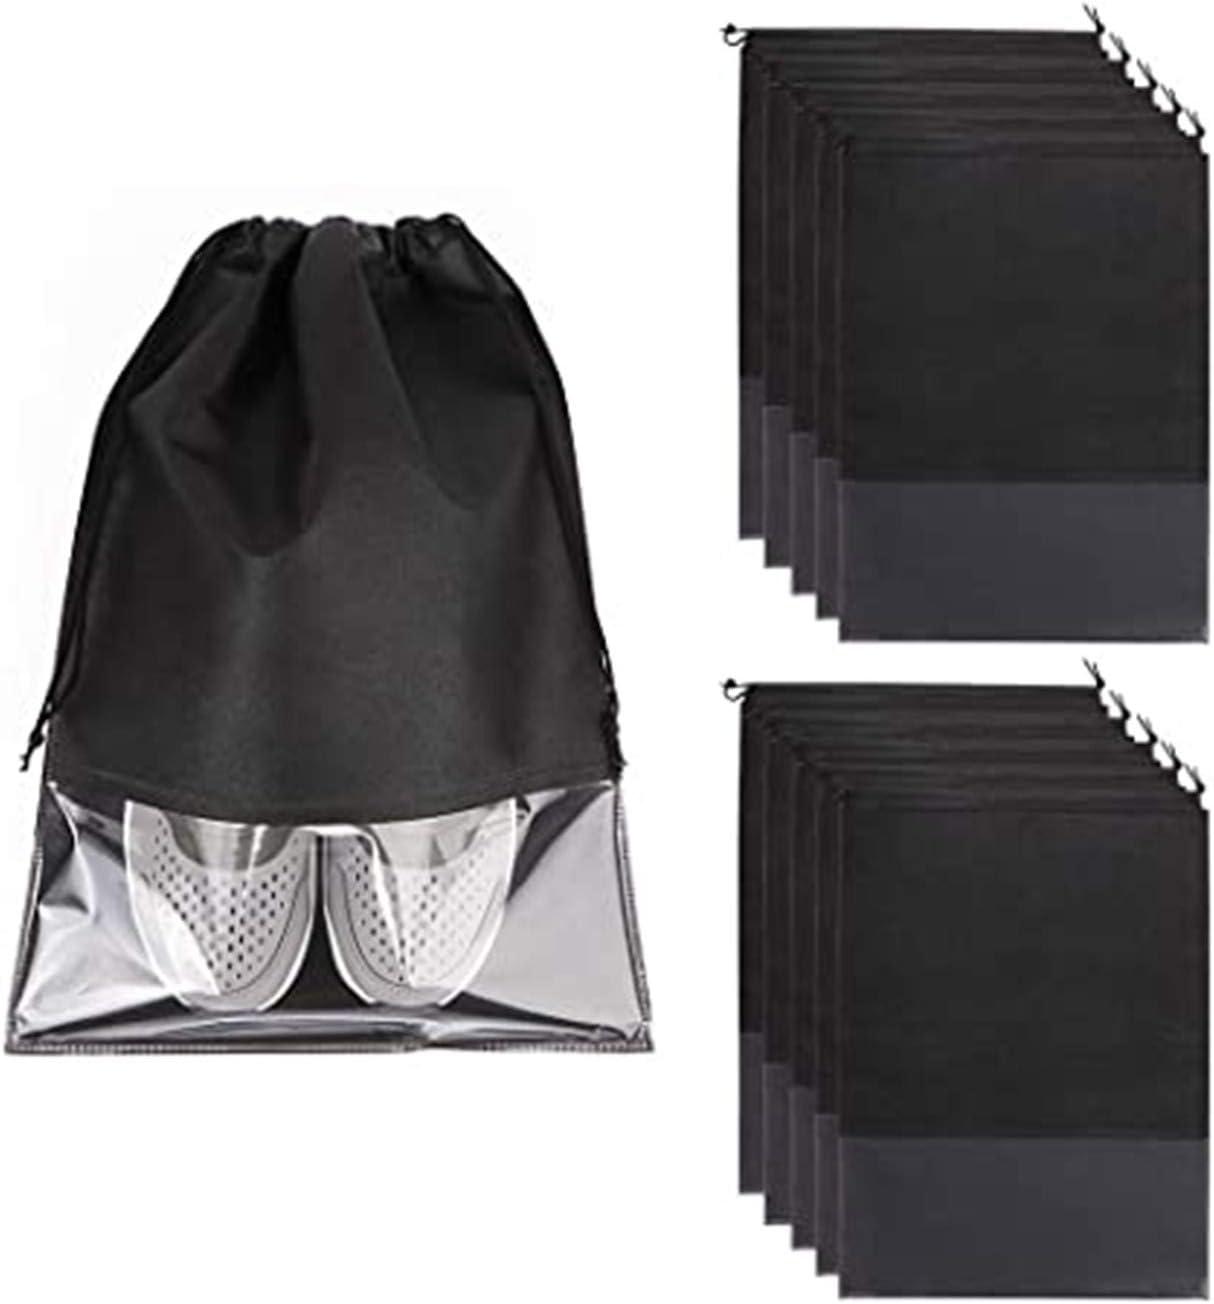 LANLBAODAN New Orleans Mall 10 Quantity limited Pack Reusable Cotton Shoe Vegetable Portable Bags